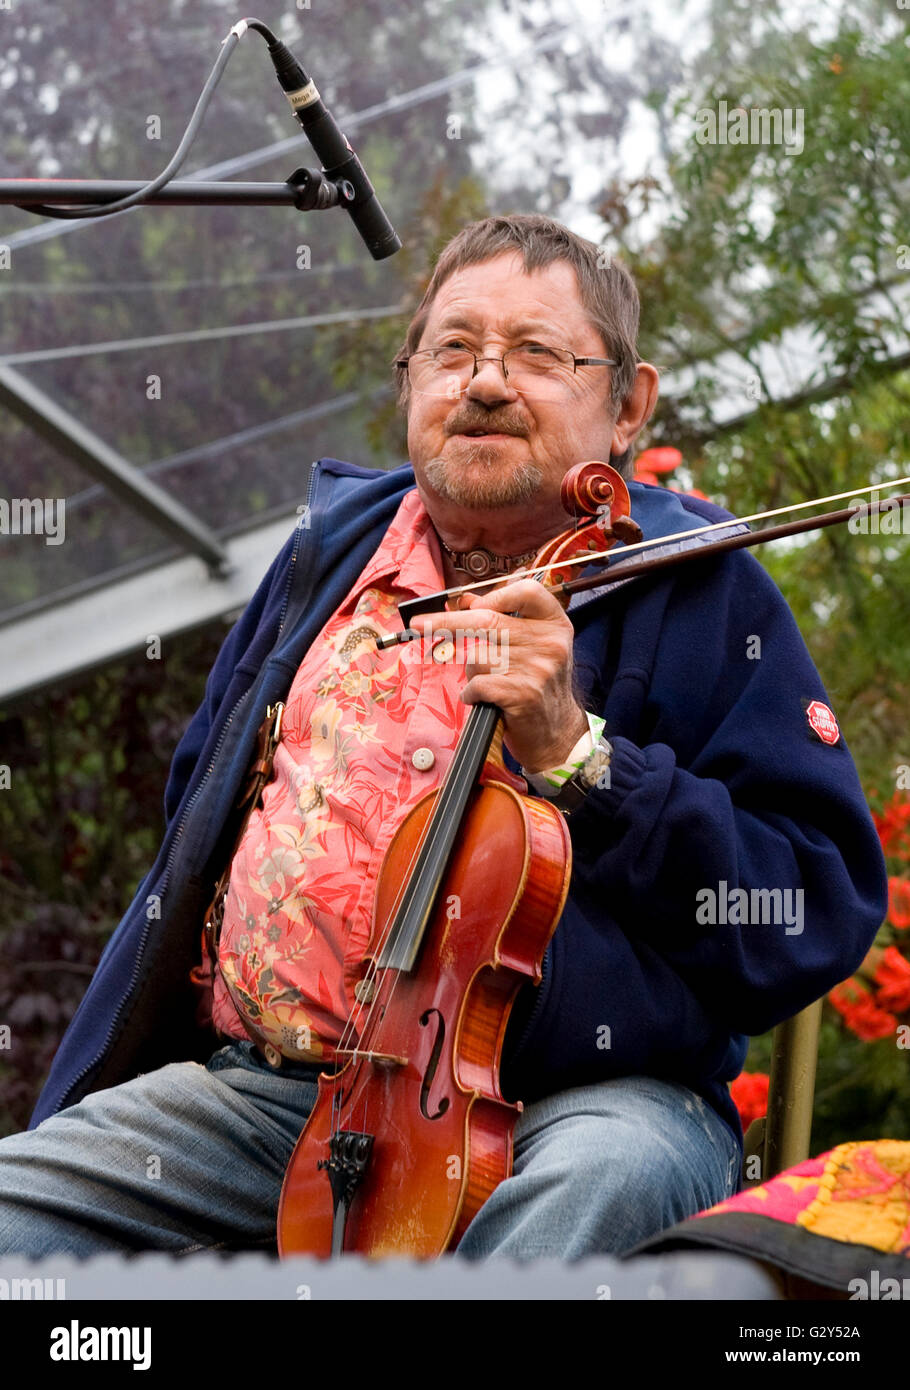 Folk musician Dave Swarbrick at Moseley Folk Festival 8th September 2009. -  Stock Image